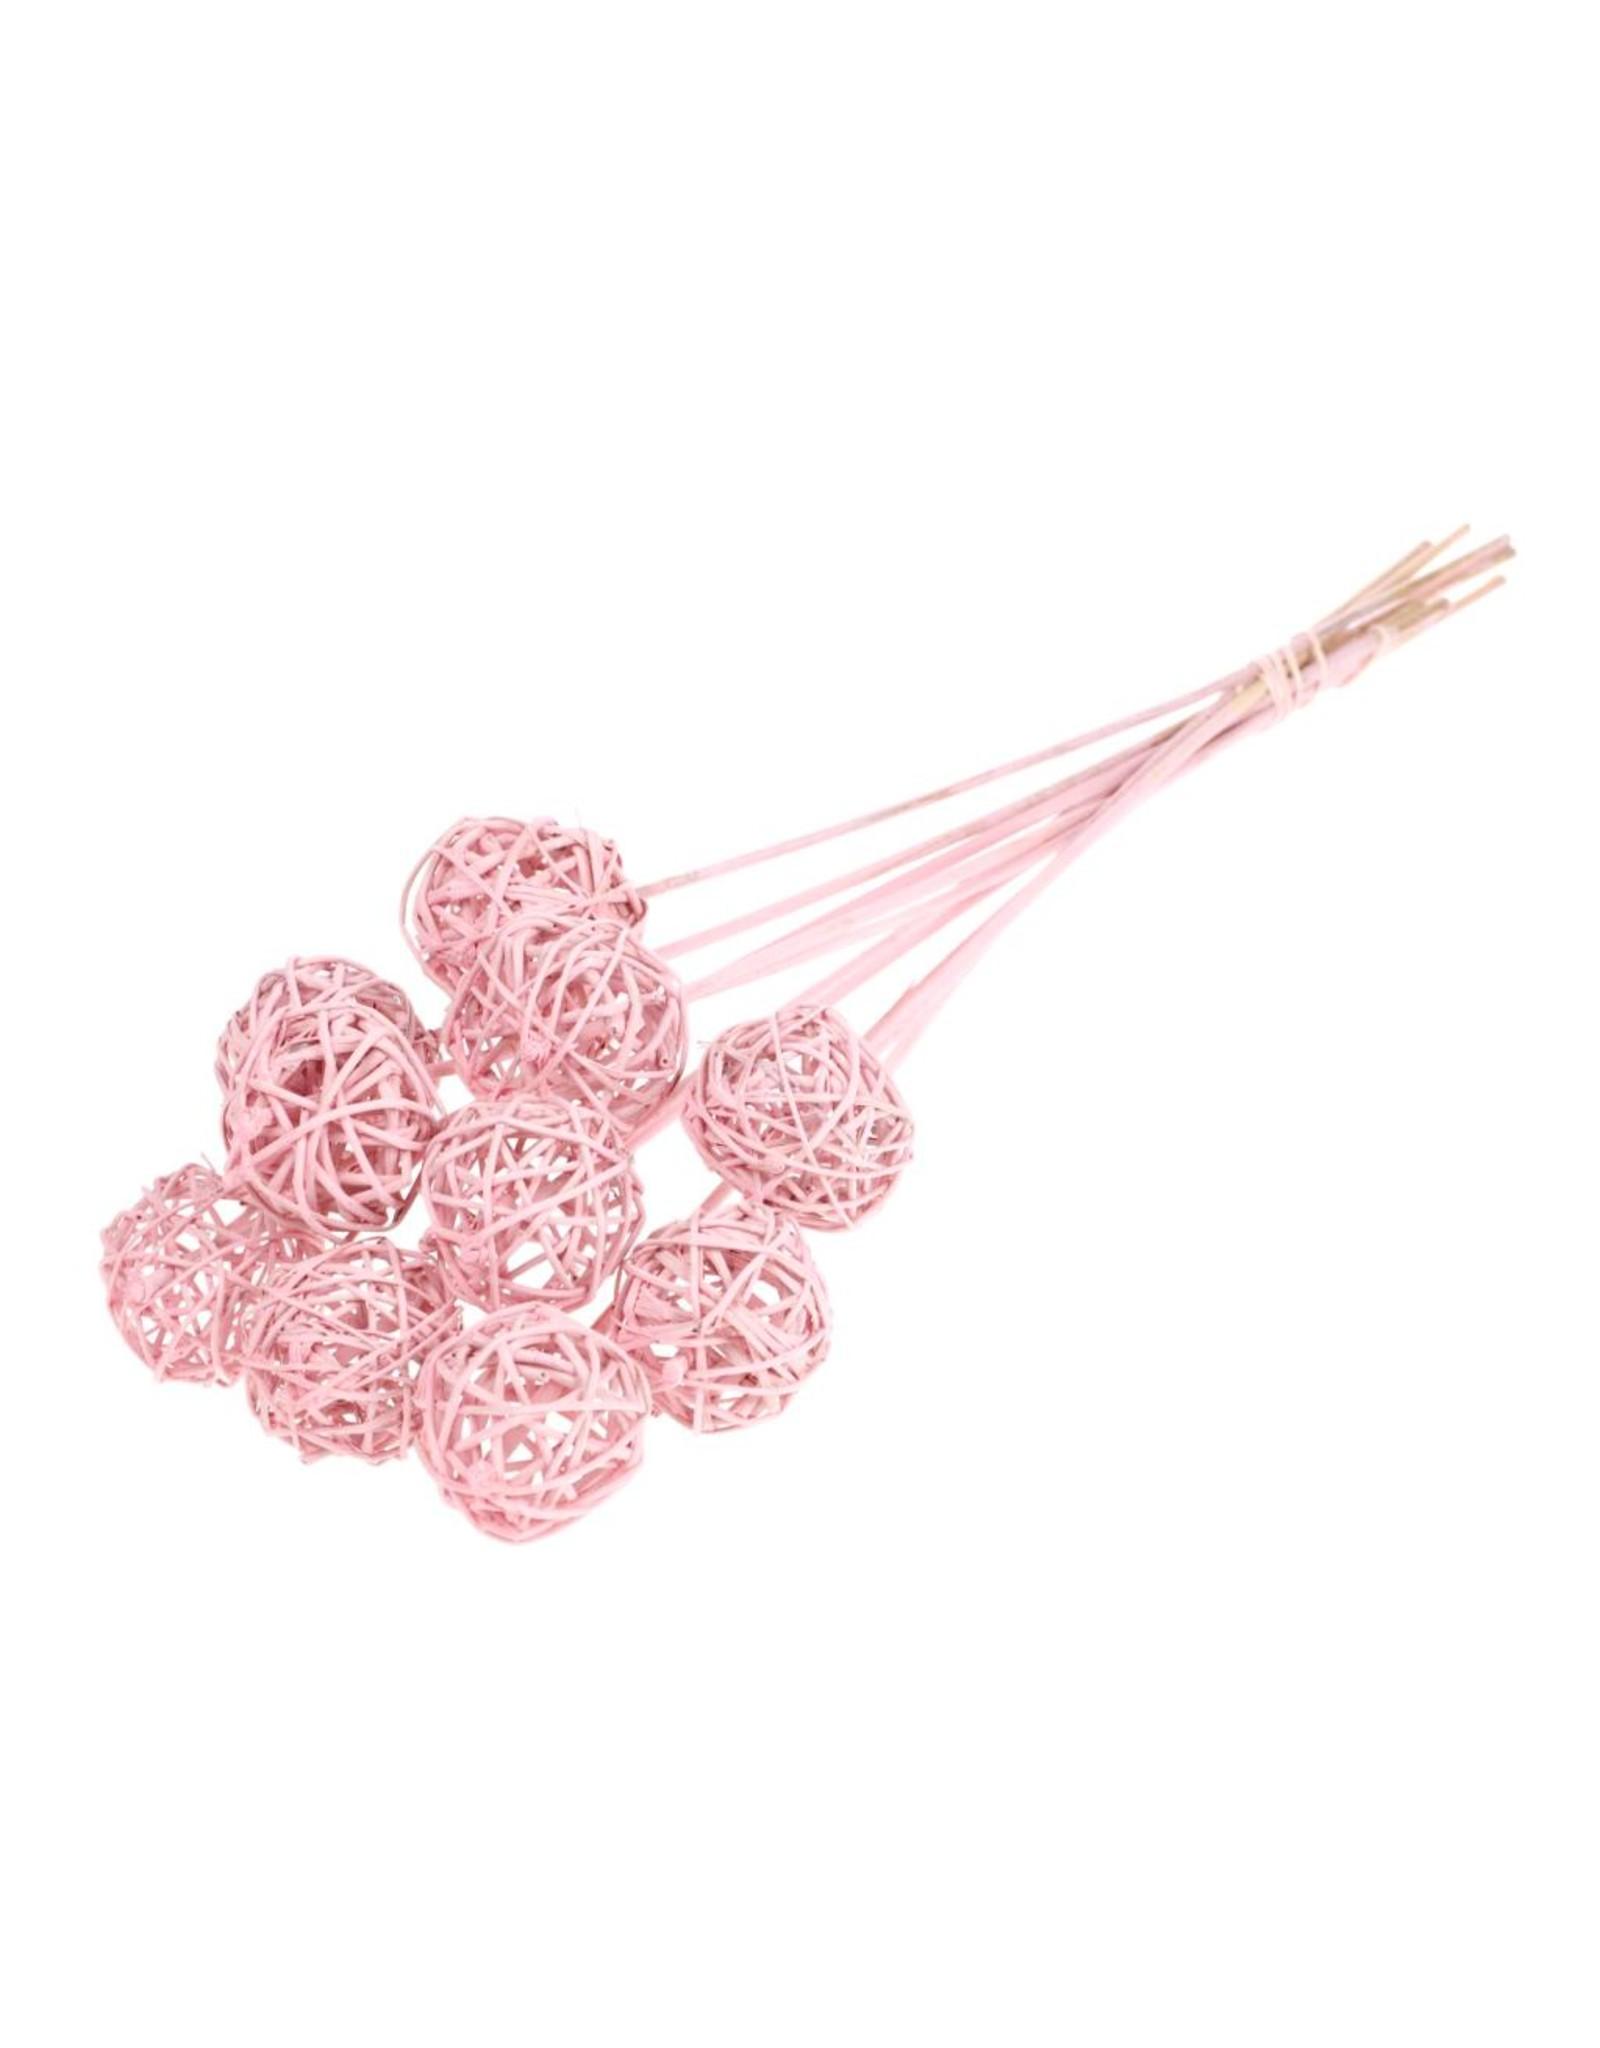 Brunch ball 5cm o/s pink misty x 15